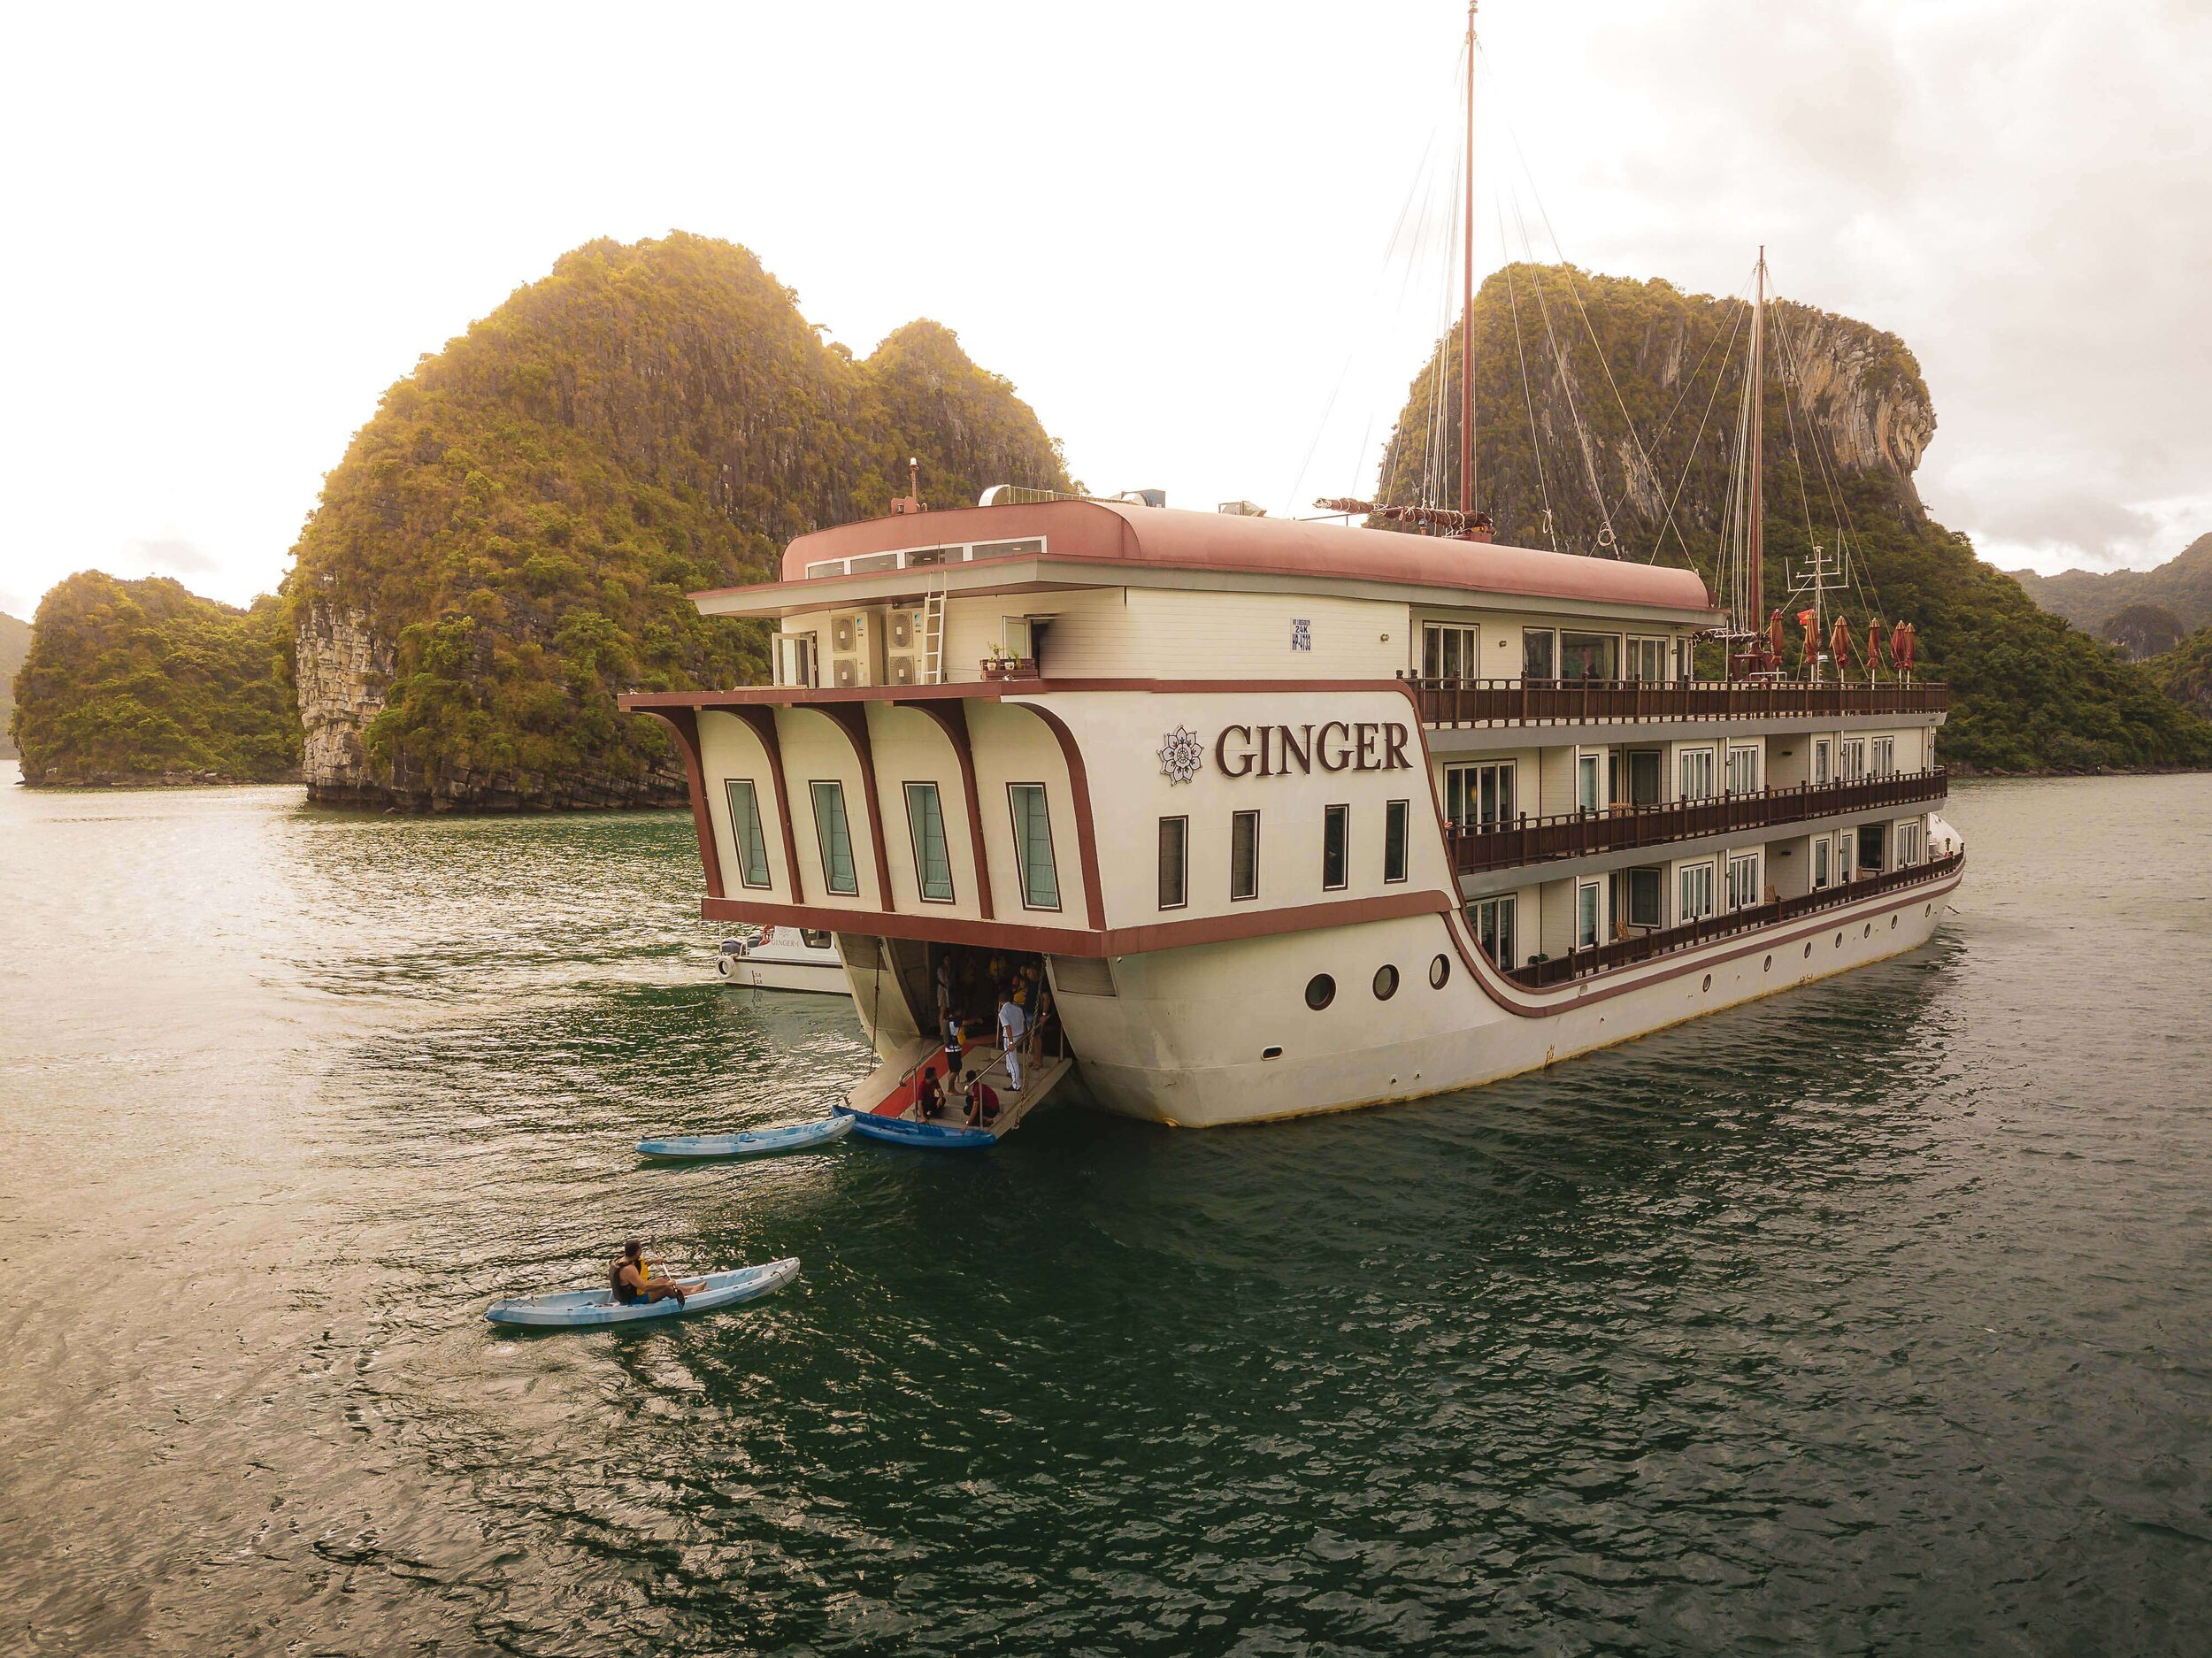 Heritage Line - Lan Ha Bay - Ginger - Ship 6.jpg